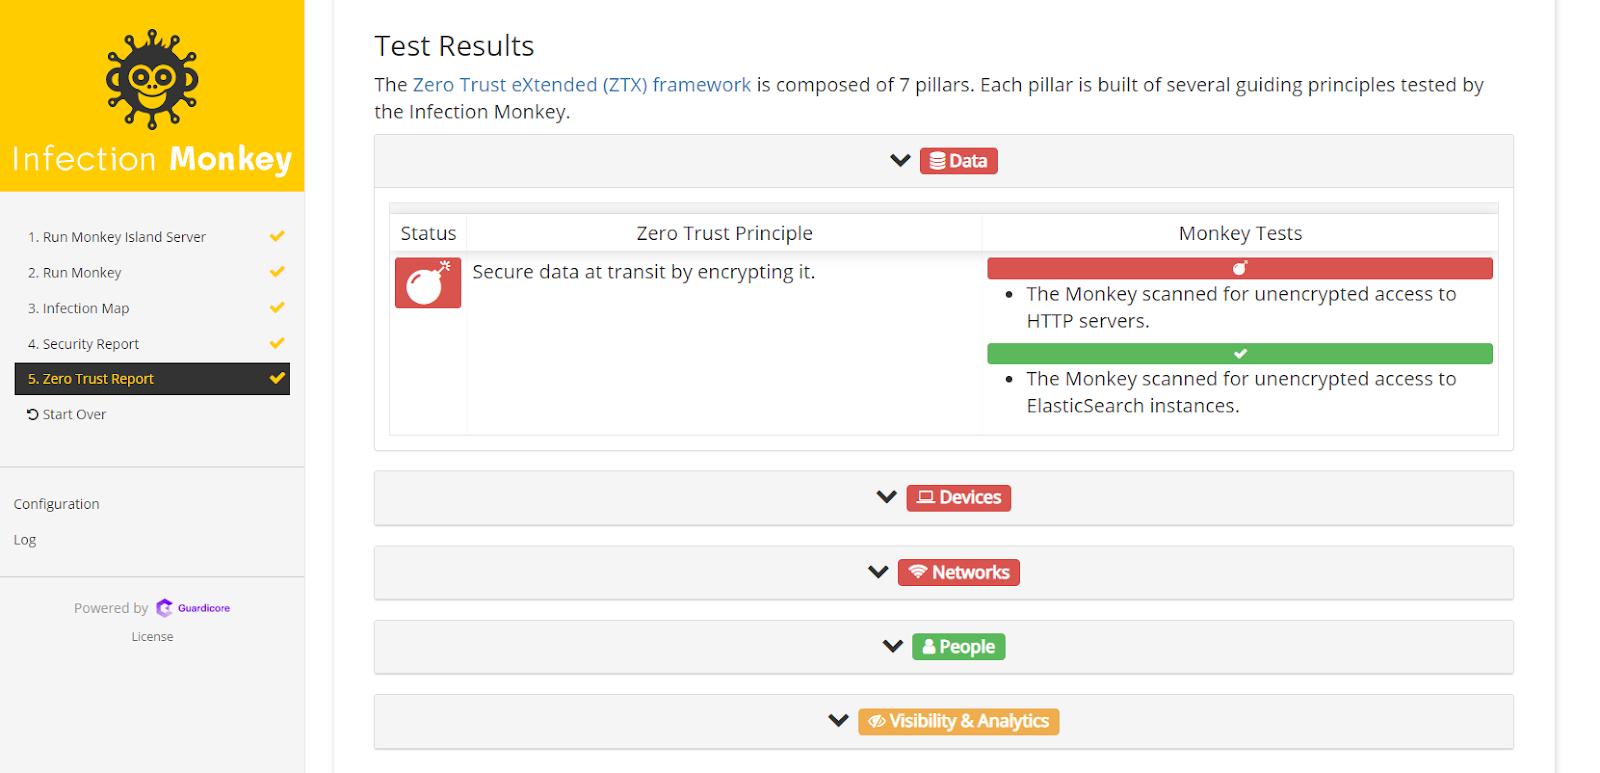 Zero Trust Report test results